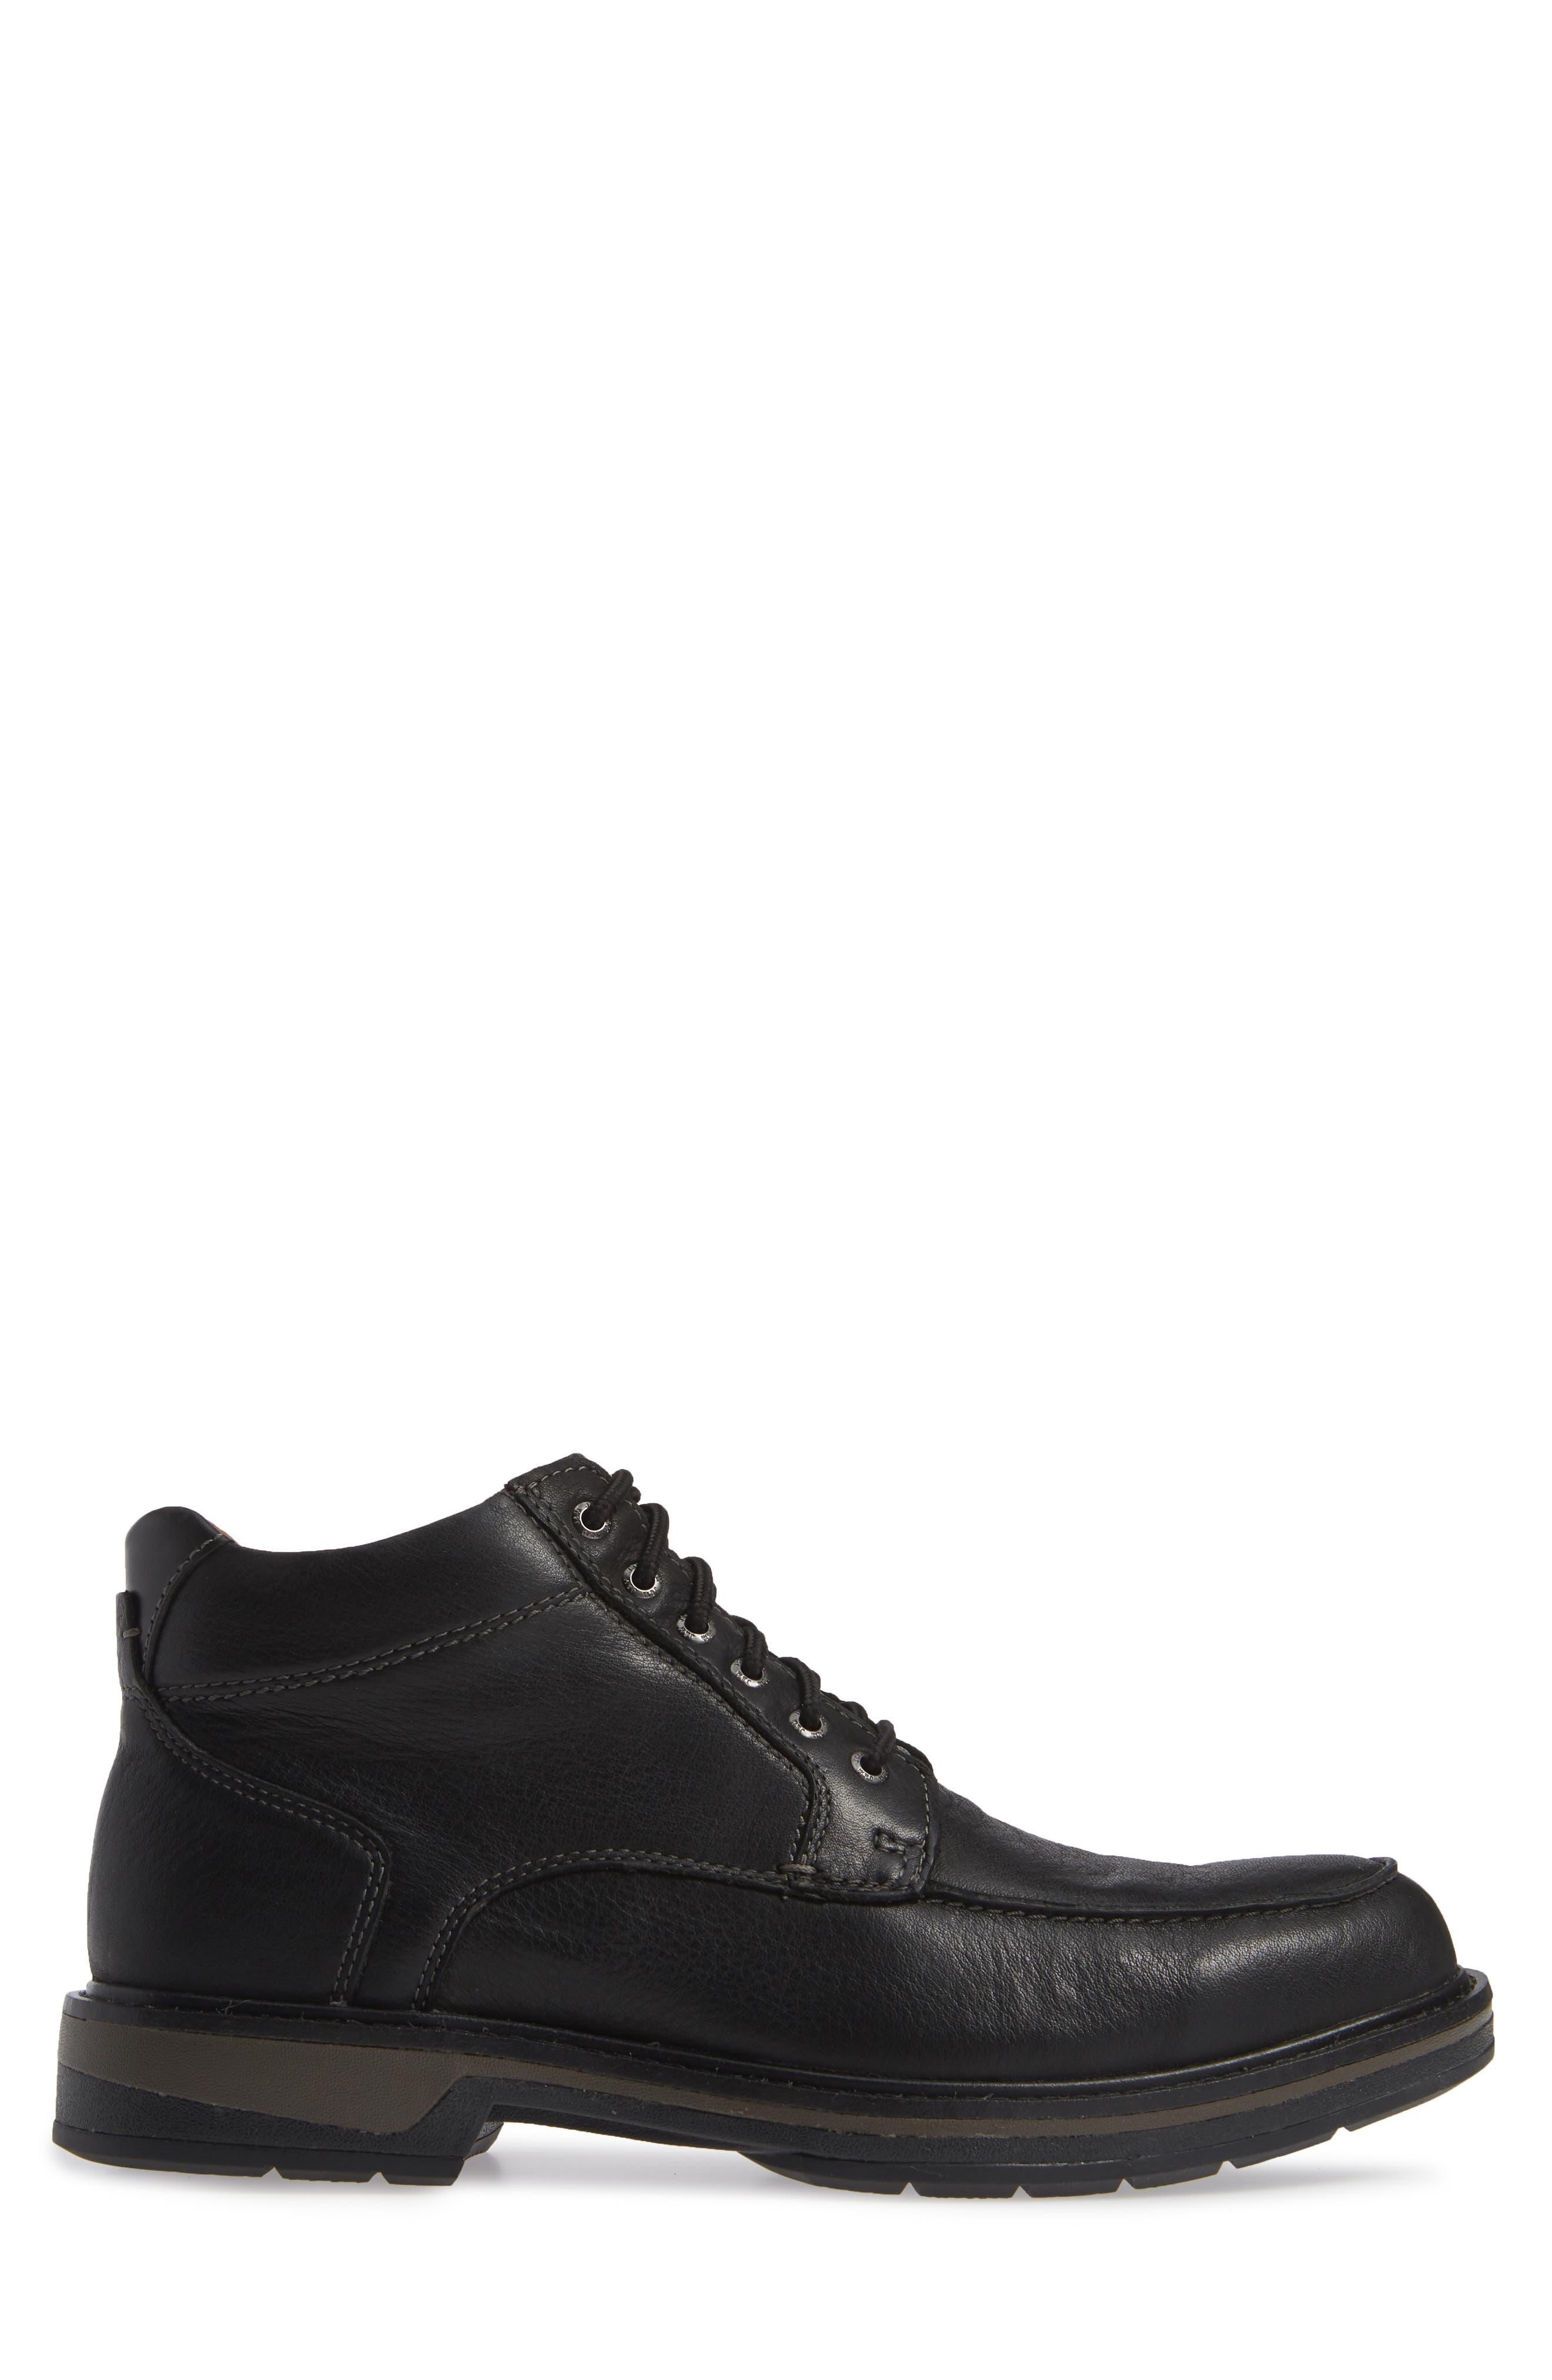 Rutledge Waterproof Moc Toe Boot,                             Alternate thumbnail 3, color,                             BLACK LEATHER